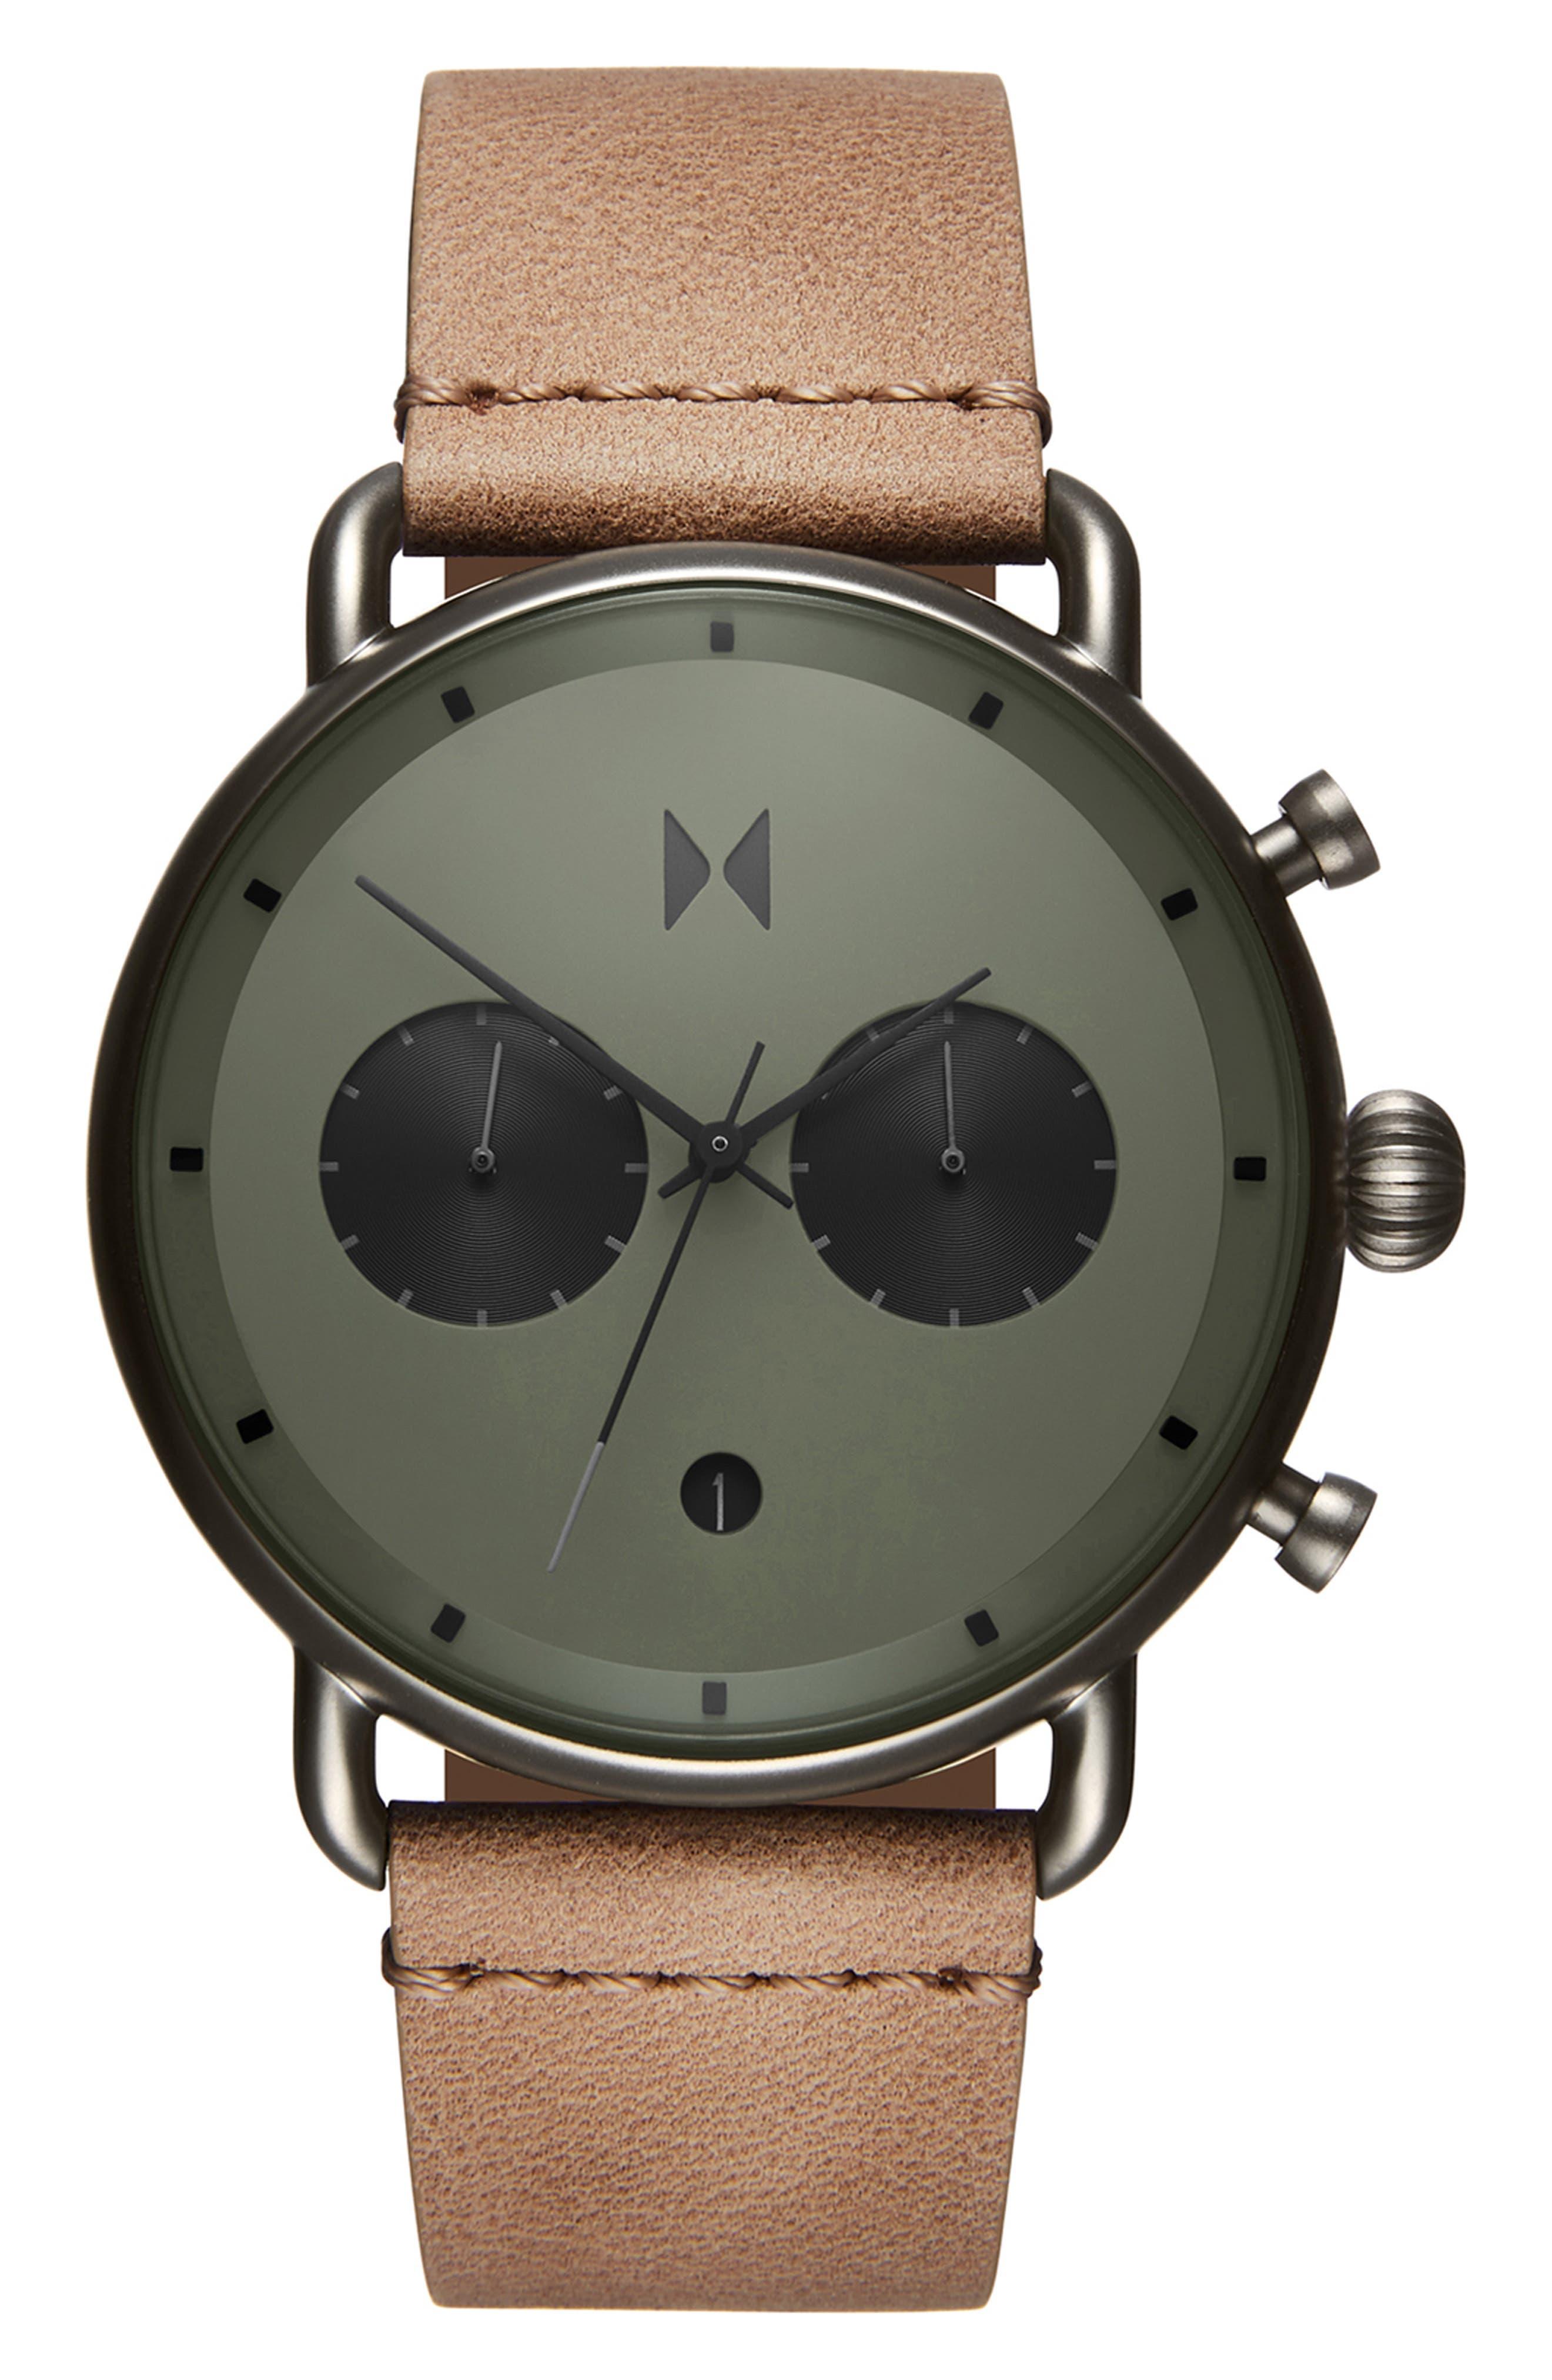 MVMT, Blacktop Chronograph Leather Strap Watch, Main thumbnail 1, color, GREEN/ SANDSTONE